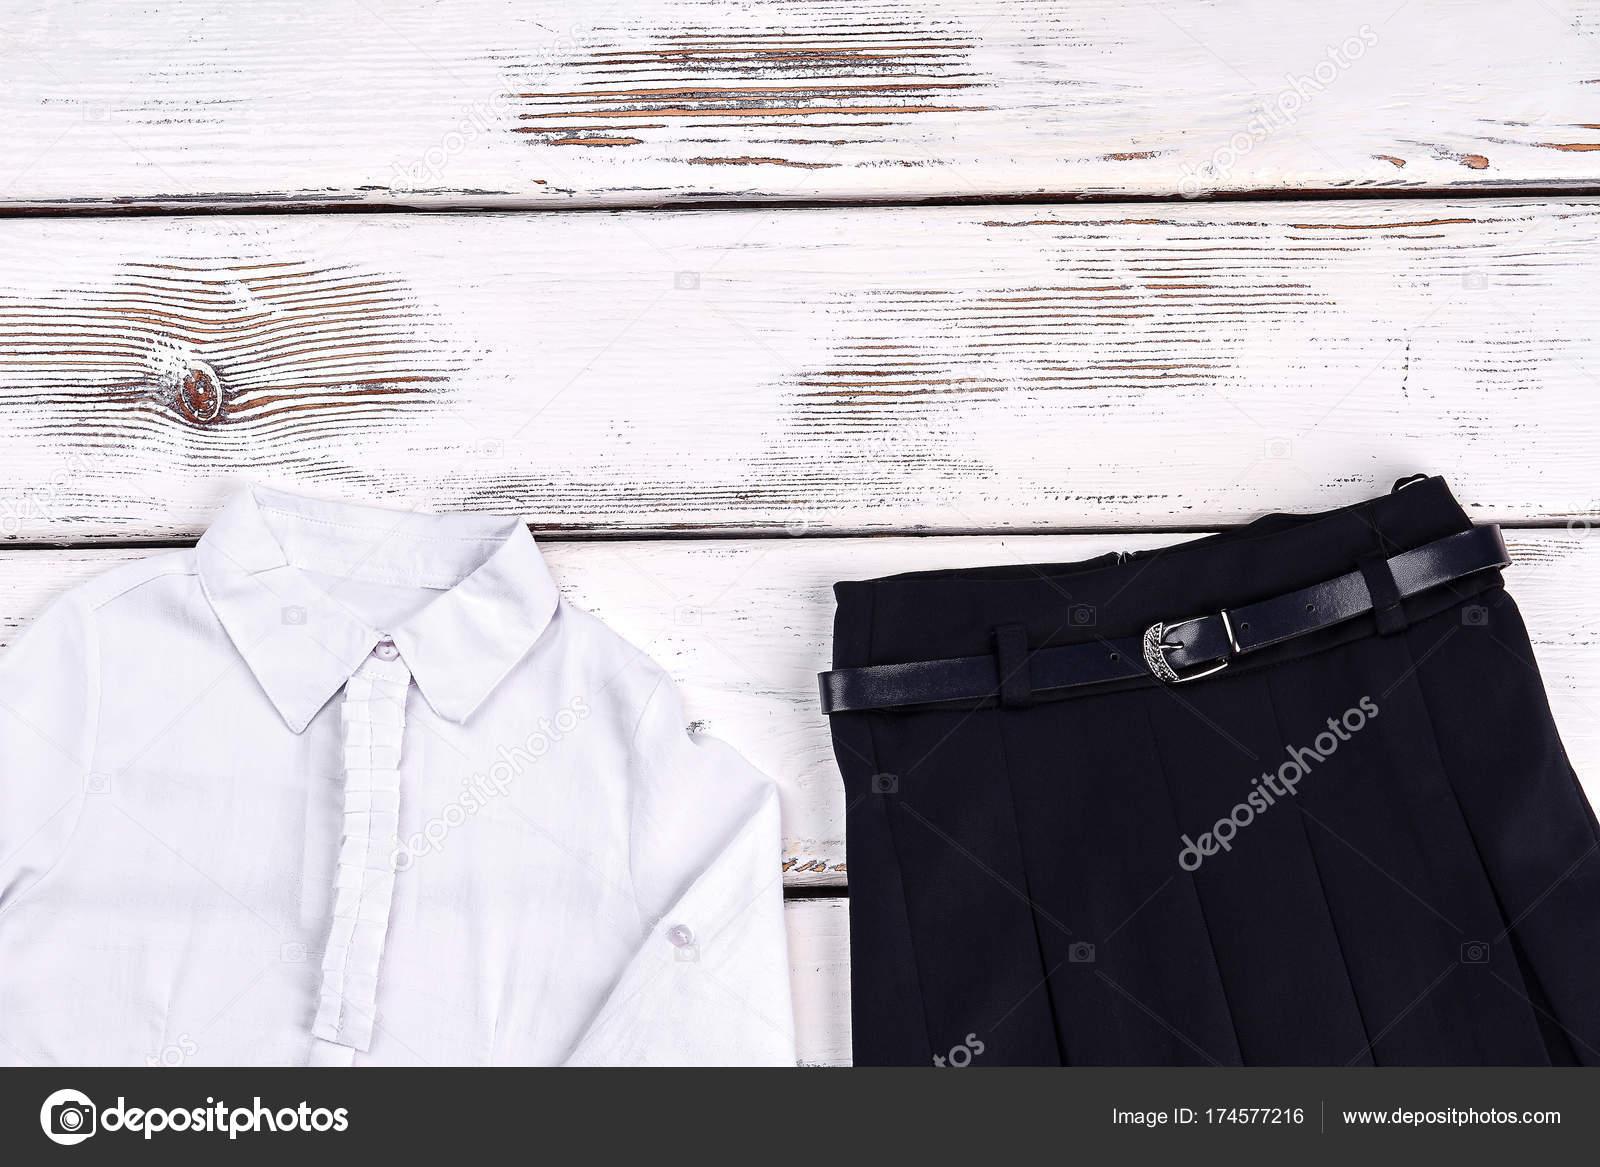 96f6d0947 Elegante camisa blanca y falda negra. — Foto de stock © Denisfilm ...